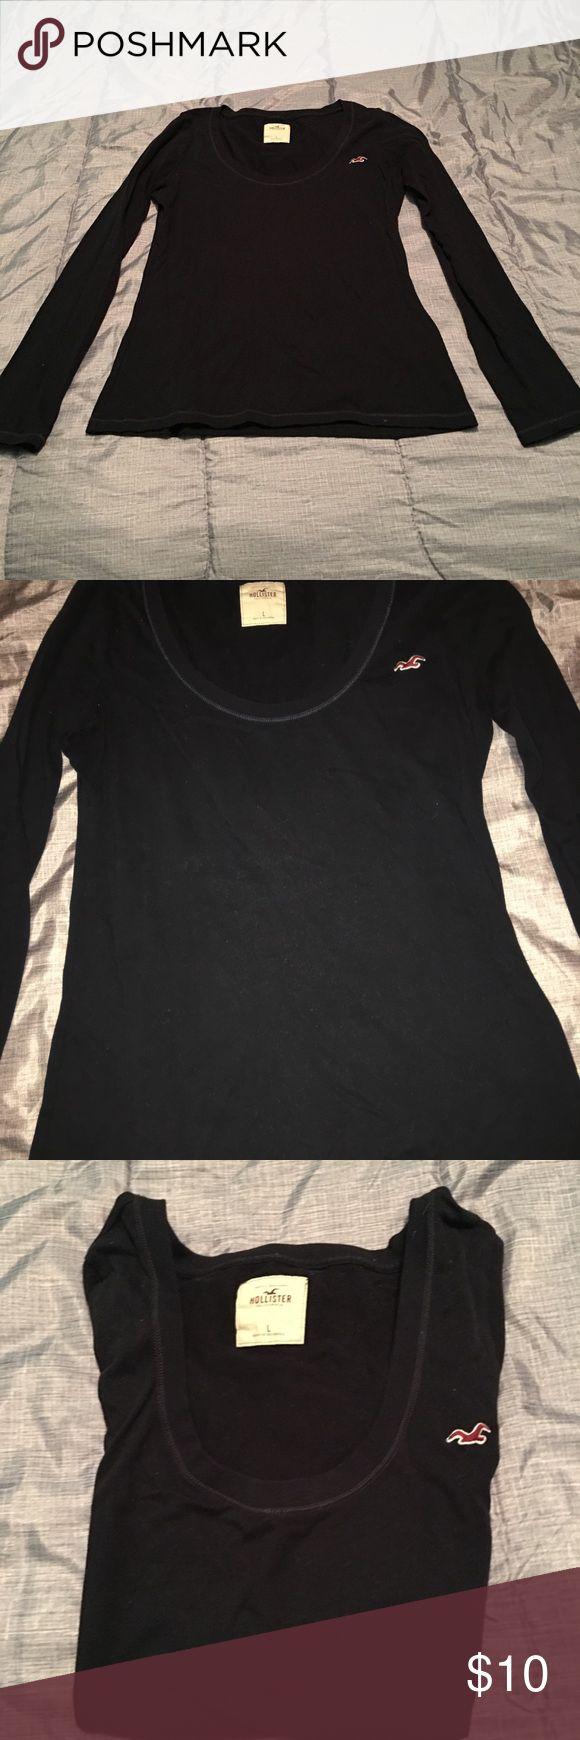 Navy Hollister Looks no Sleeve Shirt NWOT Hollister soft Long Sleeve Scoop neck Shirt. 100% cotton. Hollister Tops Tees - Long Sleeve